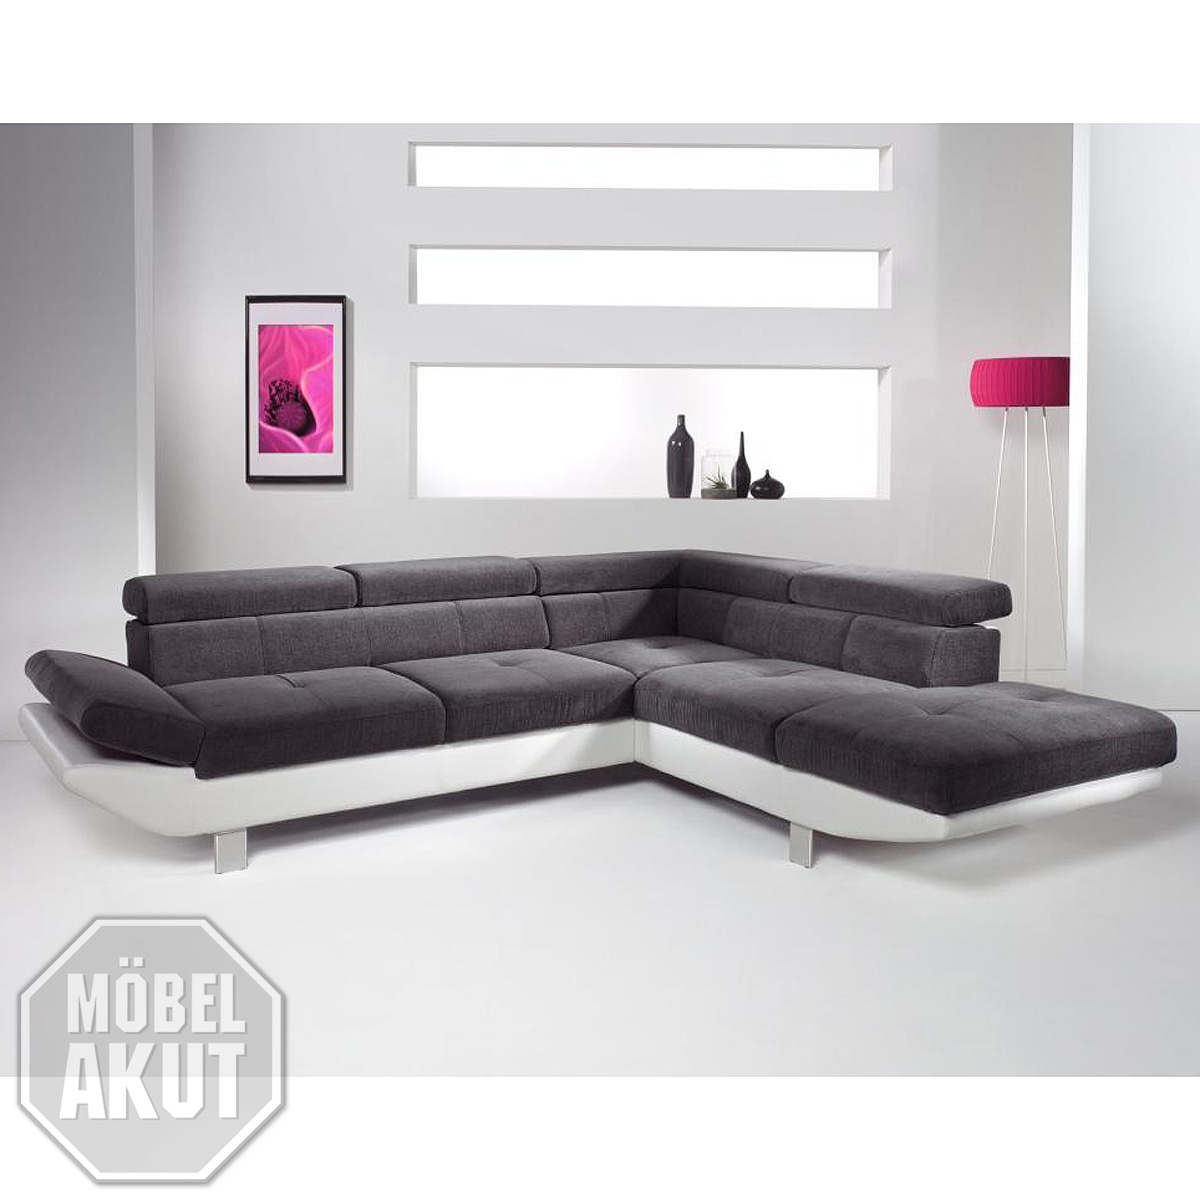 wohnlandschaft whisper ecksofa relaxfunktion wei. Black Bedroom Furniture Sets. Home Design Ideas